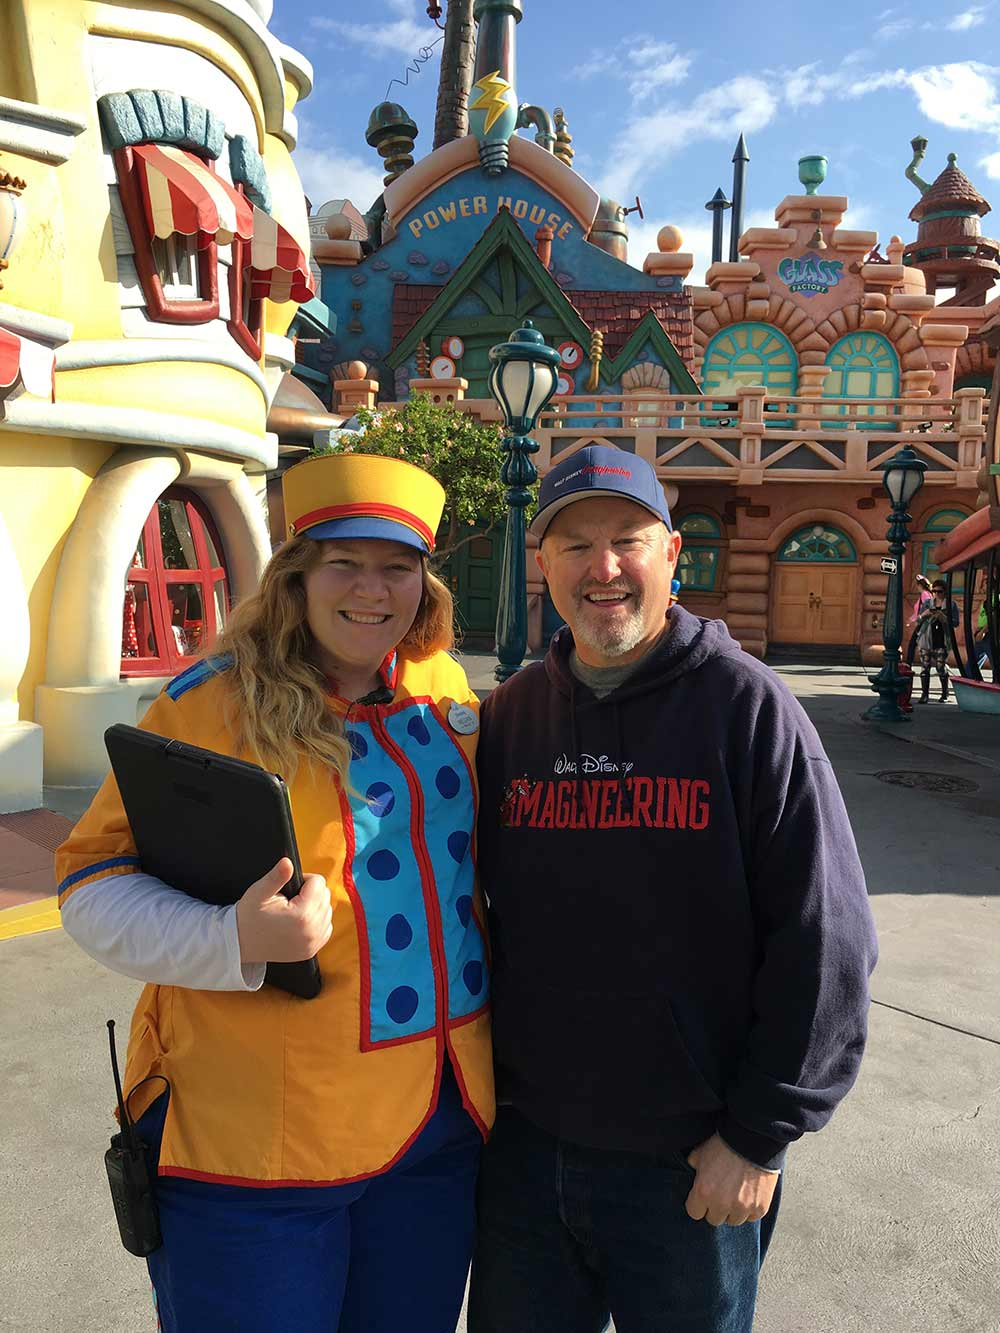 8 Disneyland Toontown Secrets